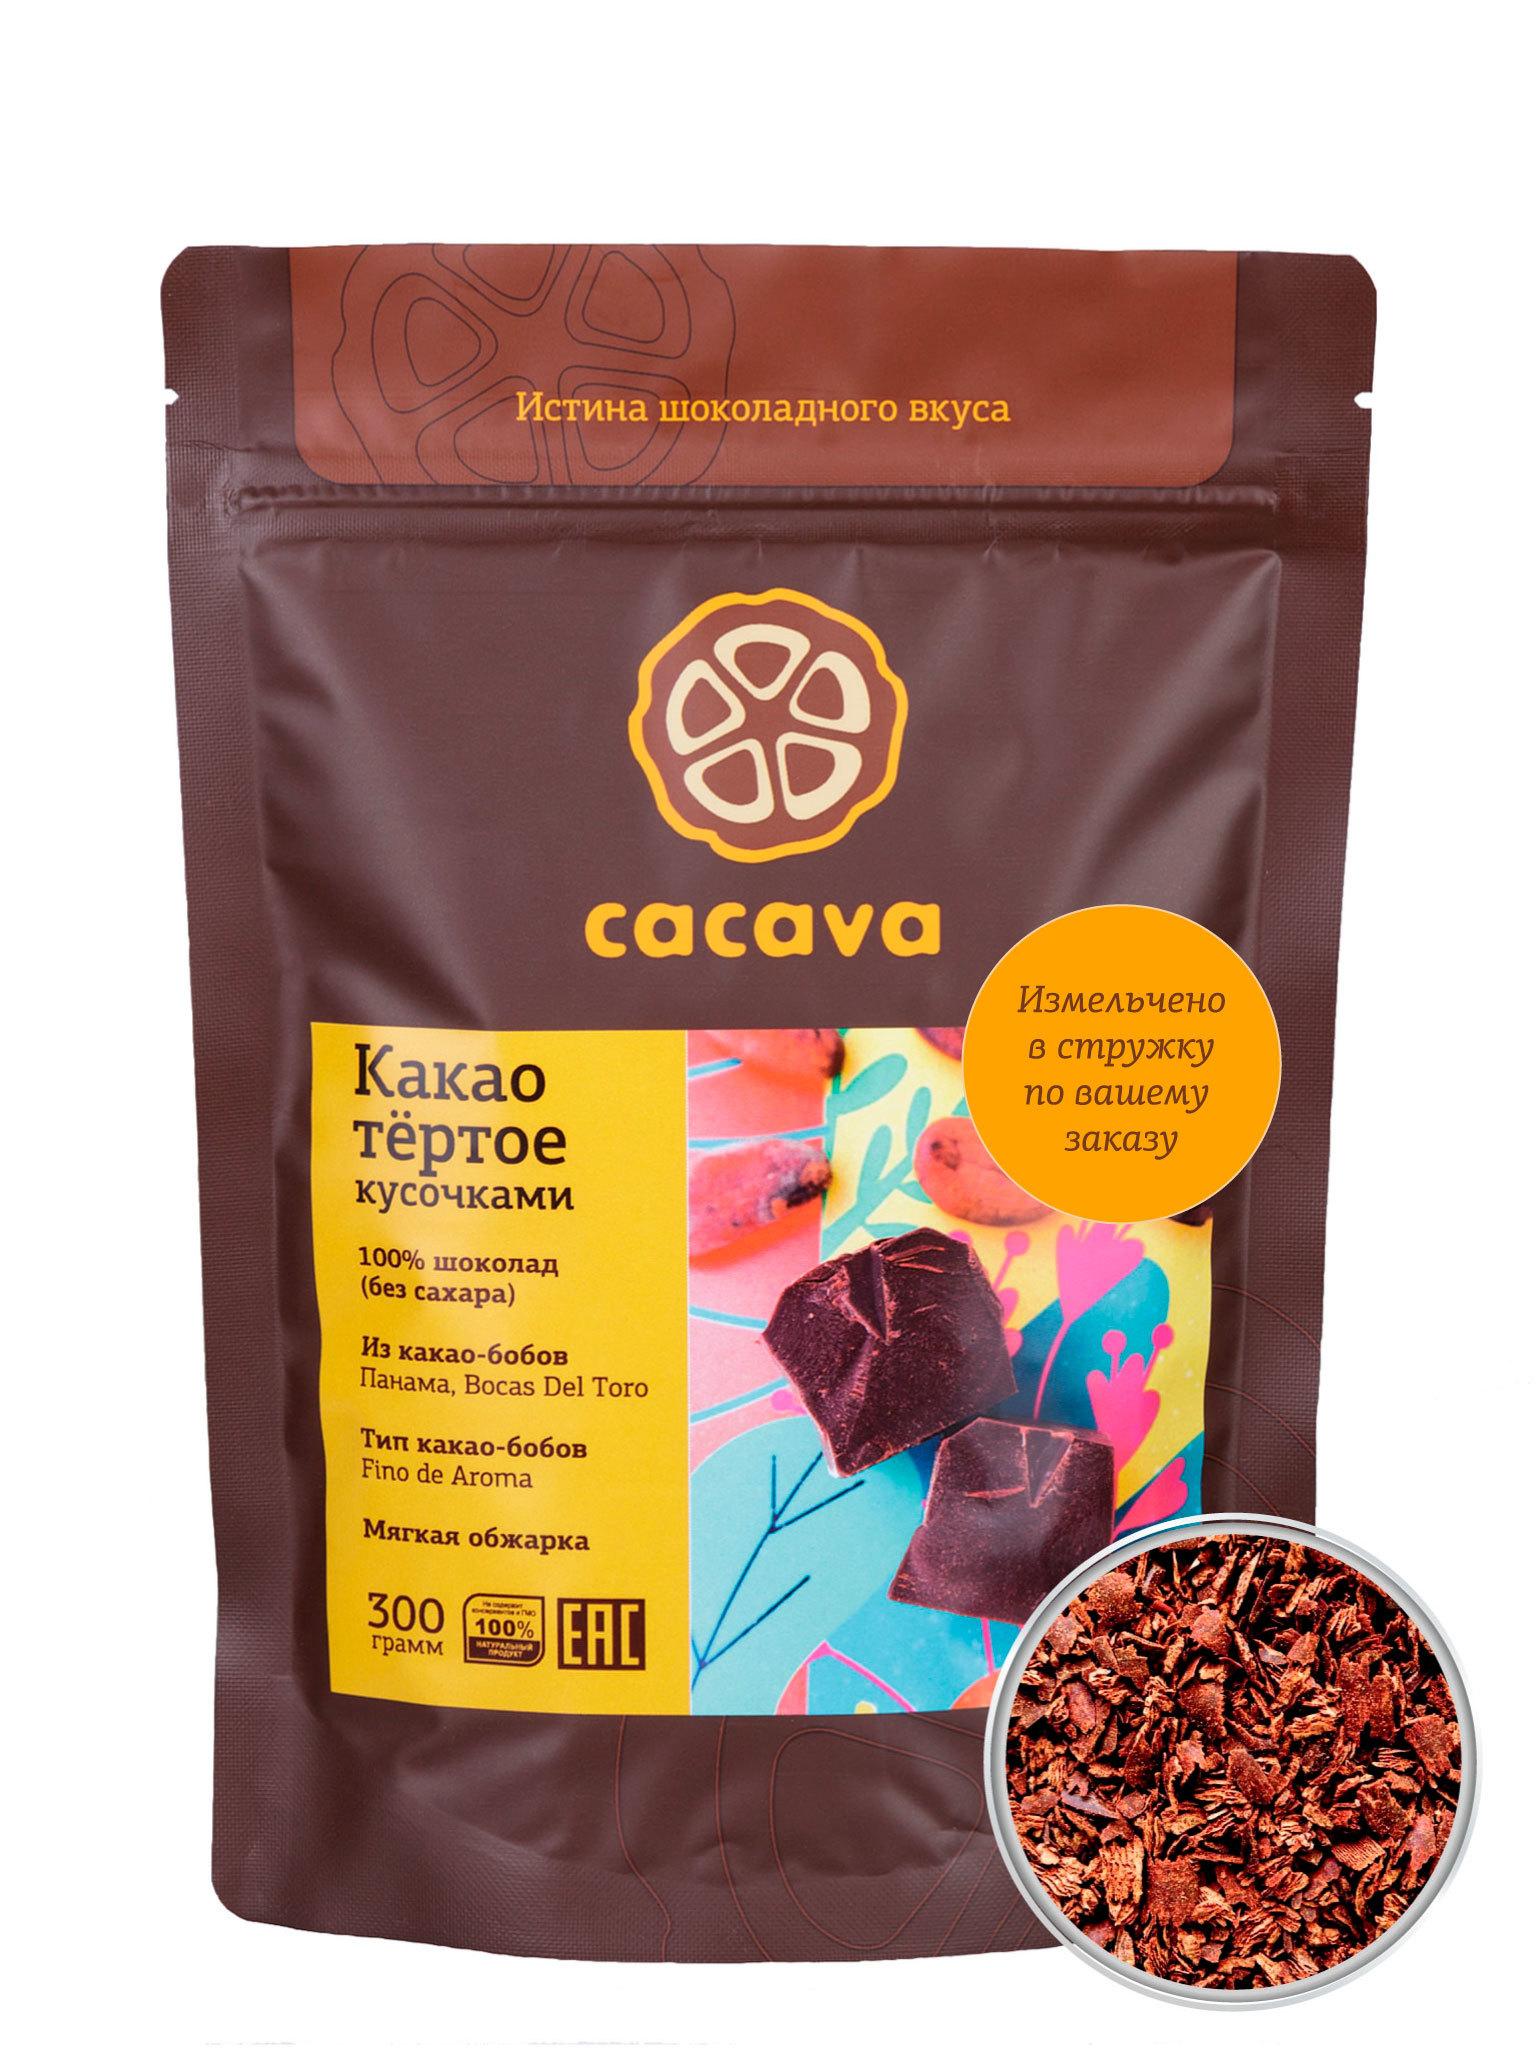 Какао тёртое в стружке (Панама), упаковка 300 грамм